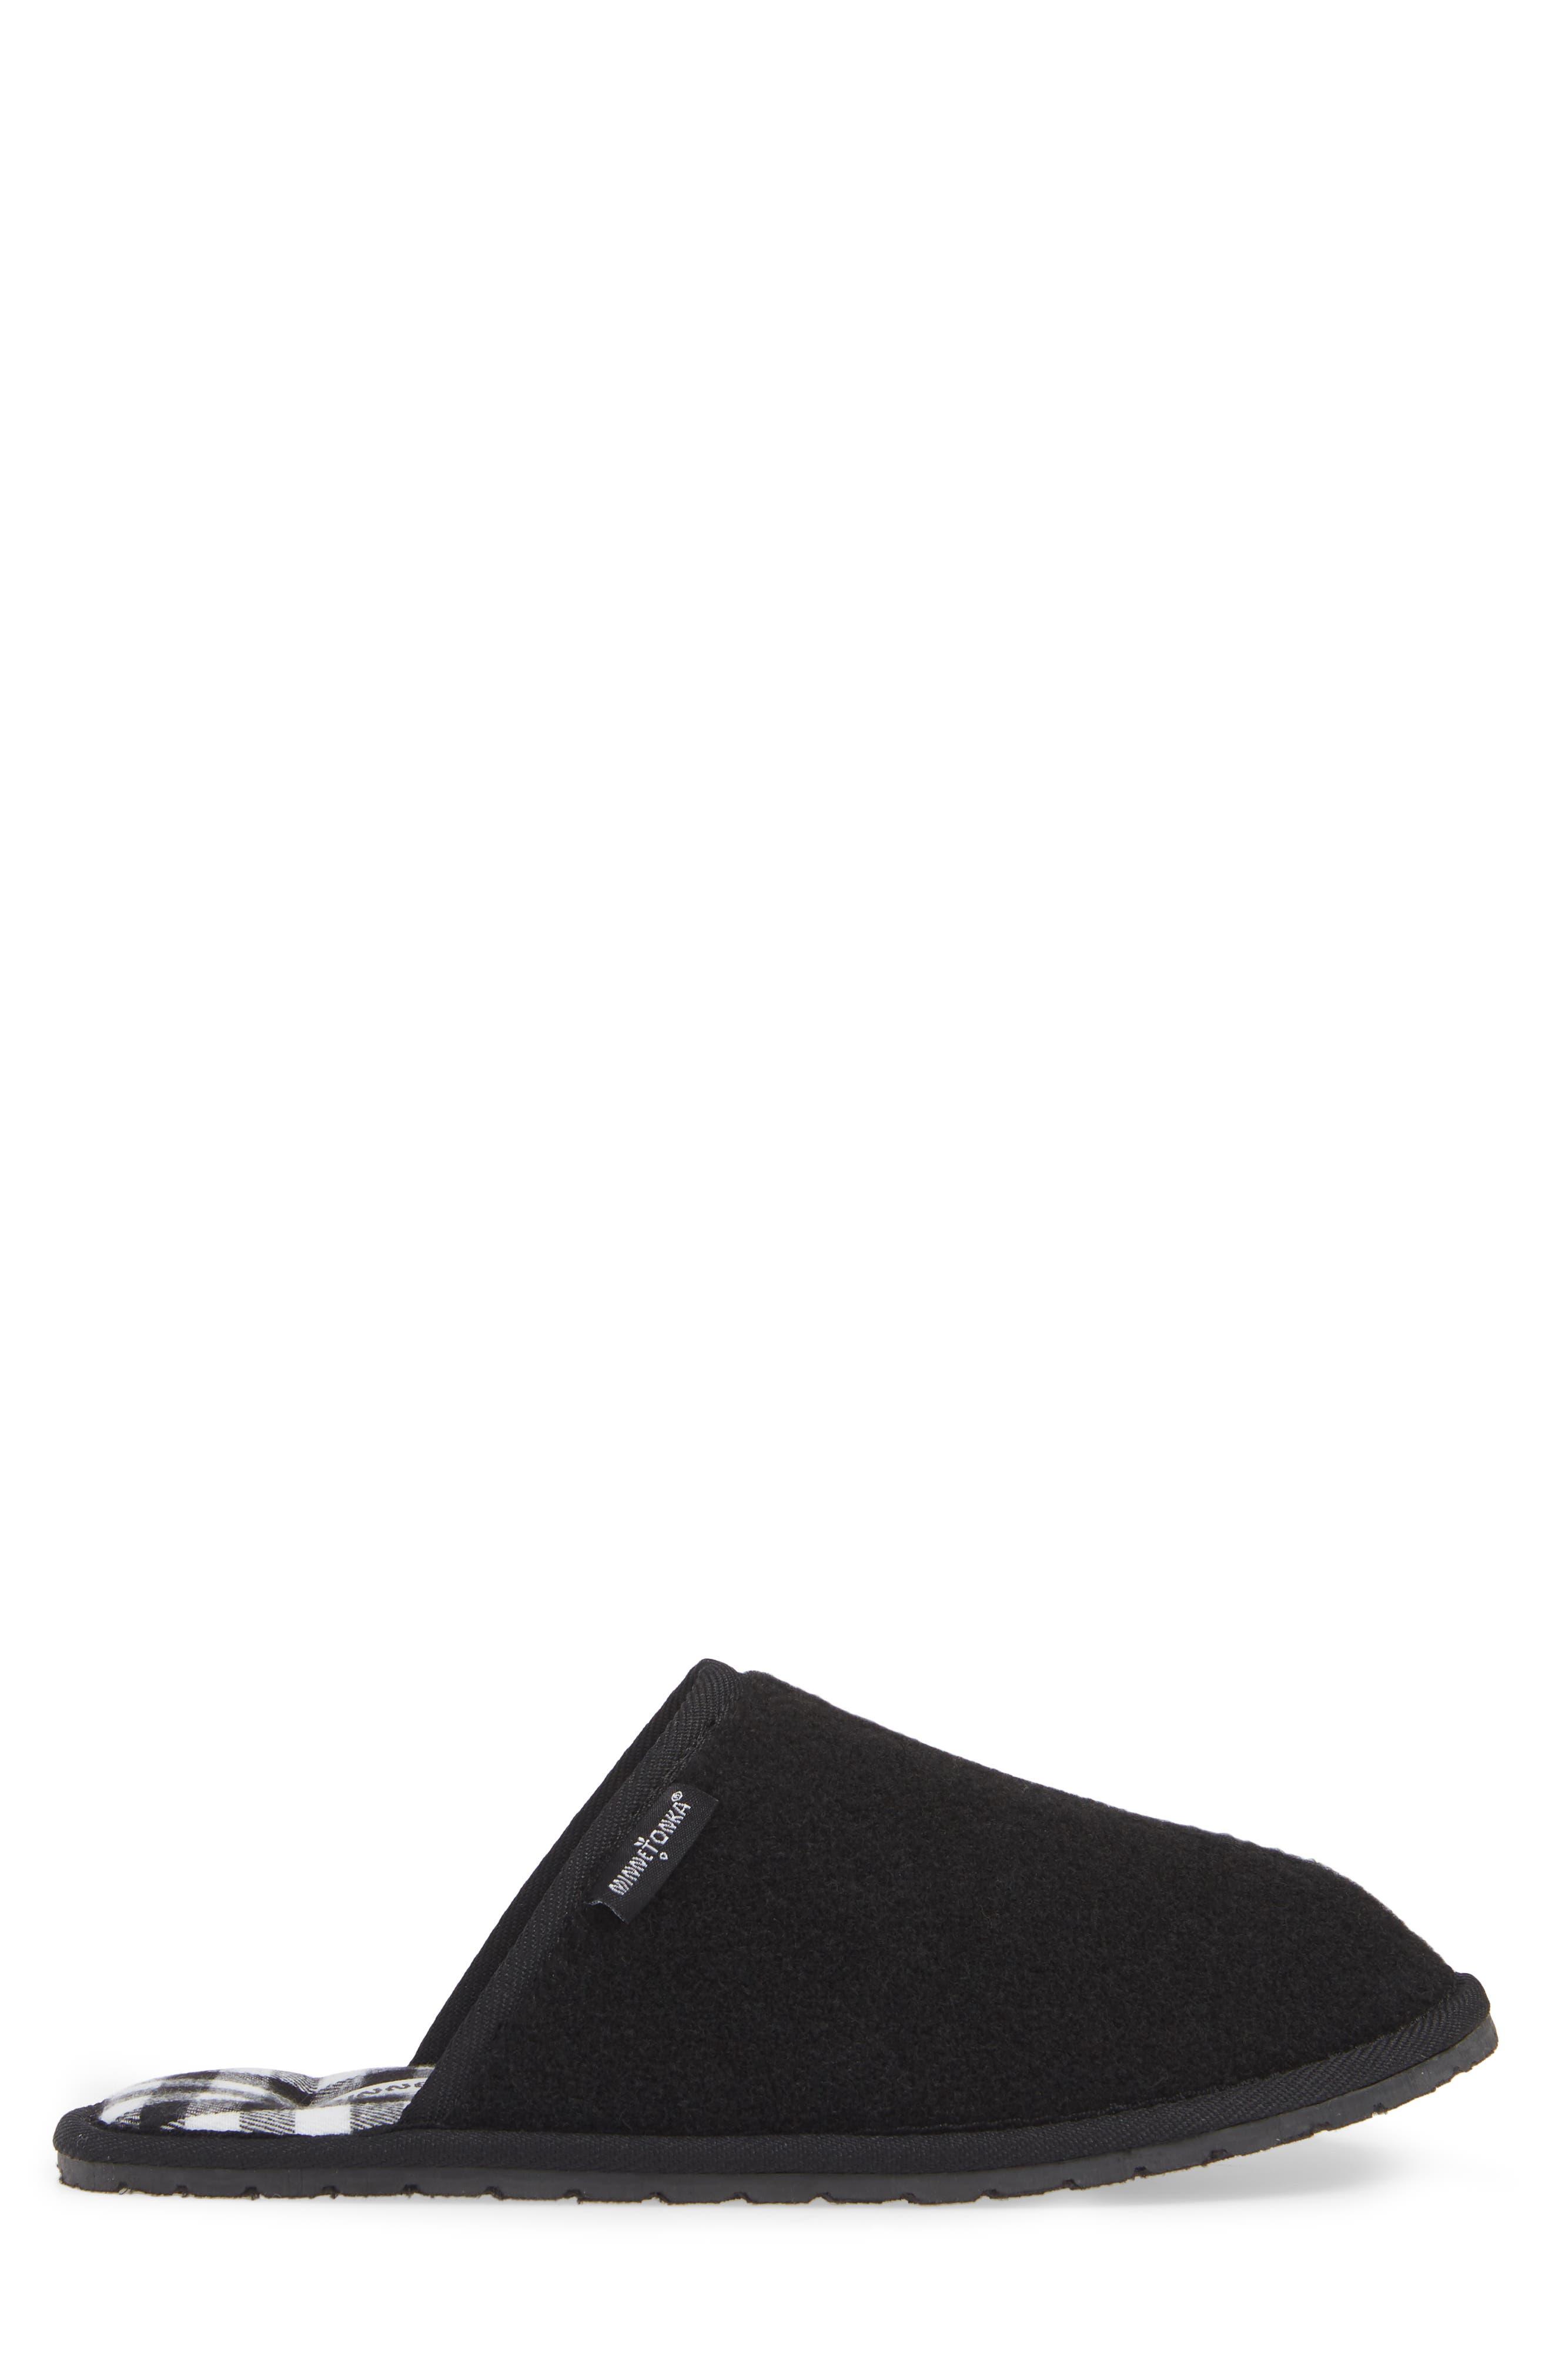 Franklin Scuff Slipper,                             Alternate thumbnail 3, color,                             BLACK PLAID